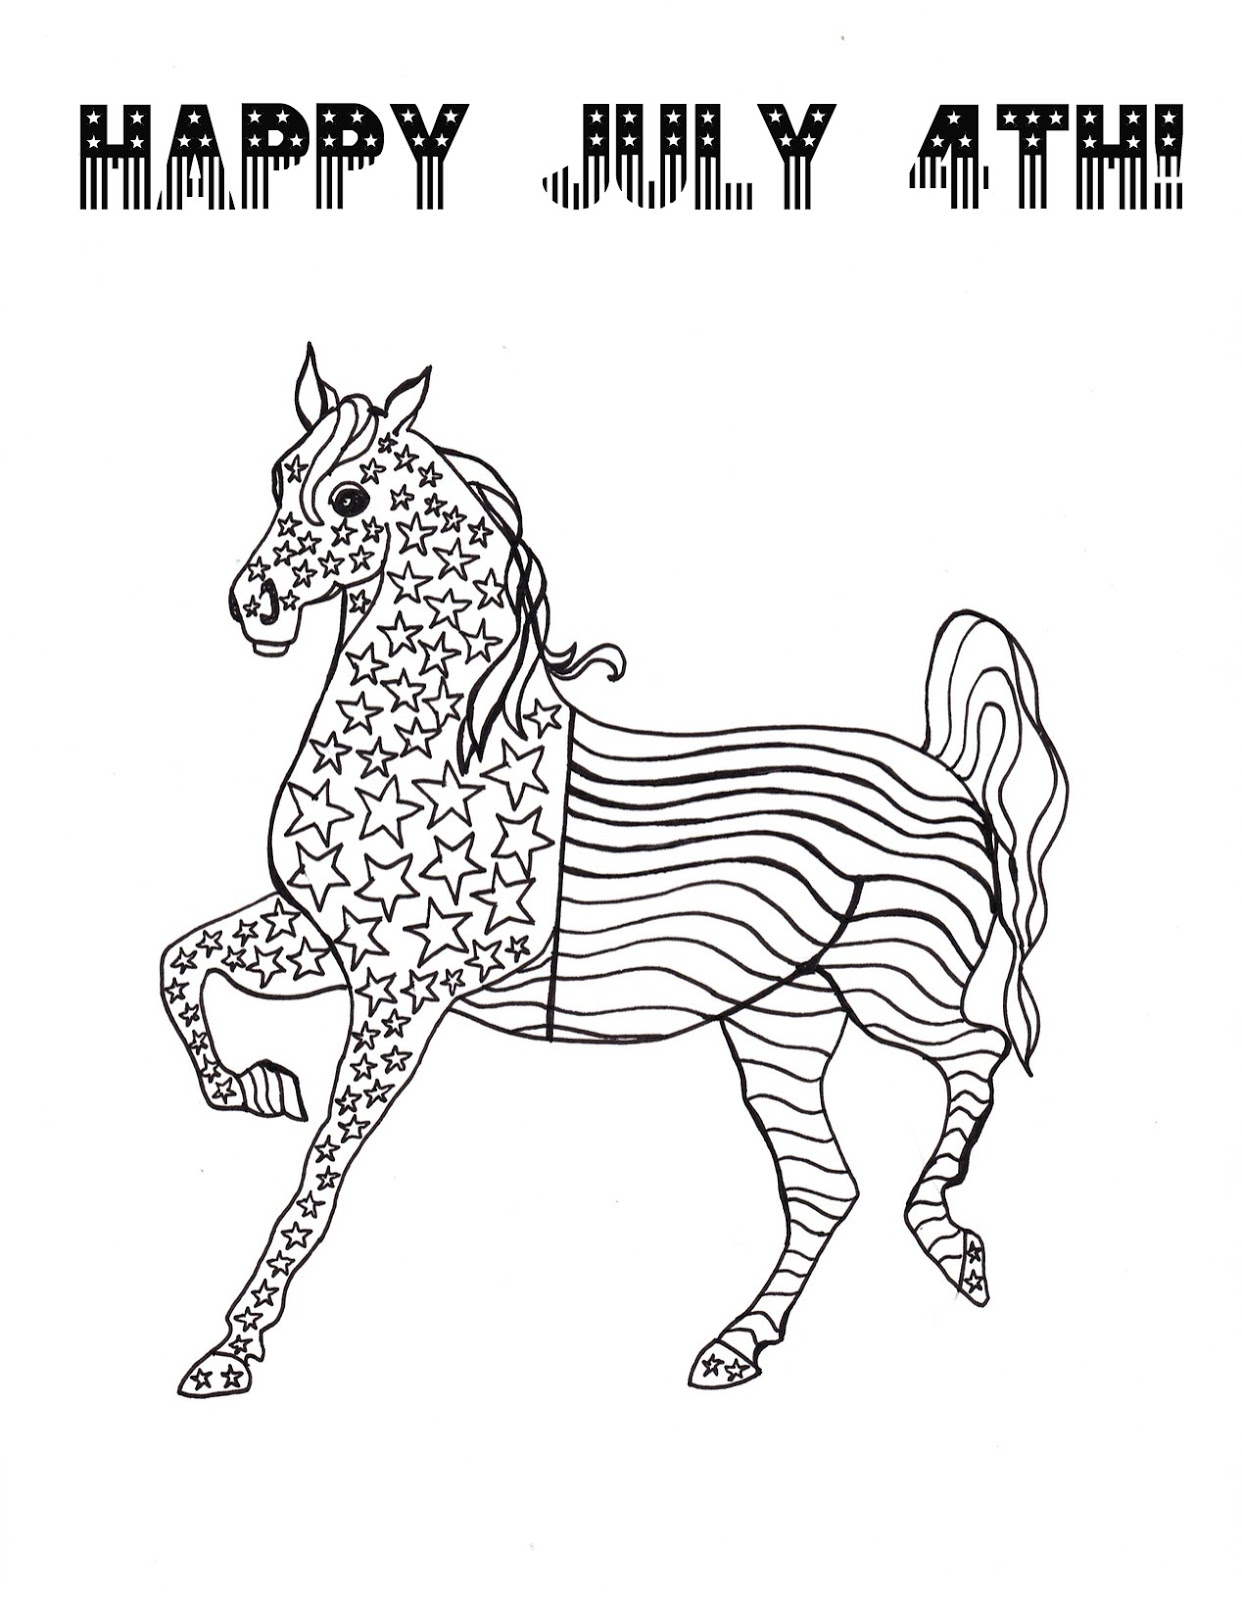 Make it easy crafts: Patriotic Horse coloring page